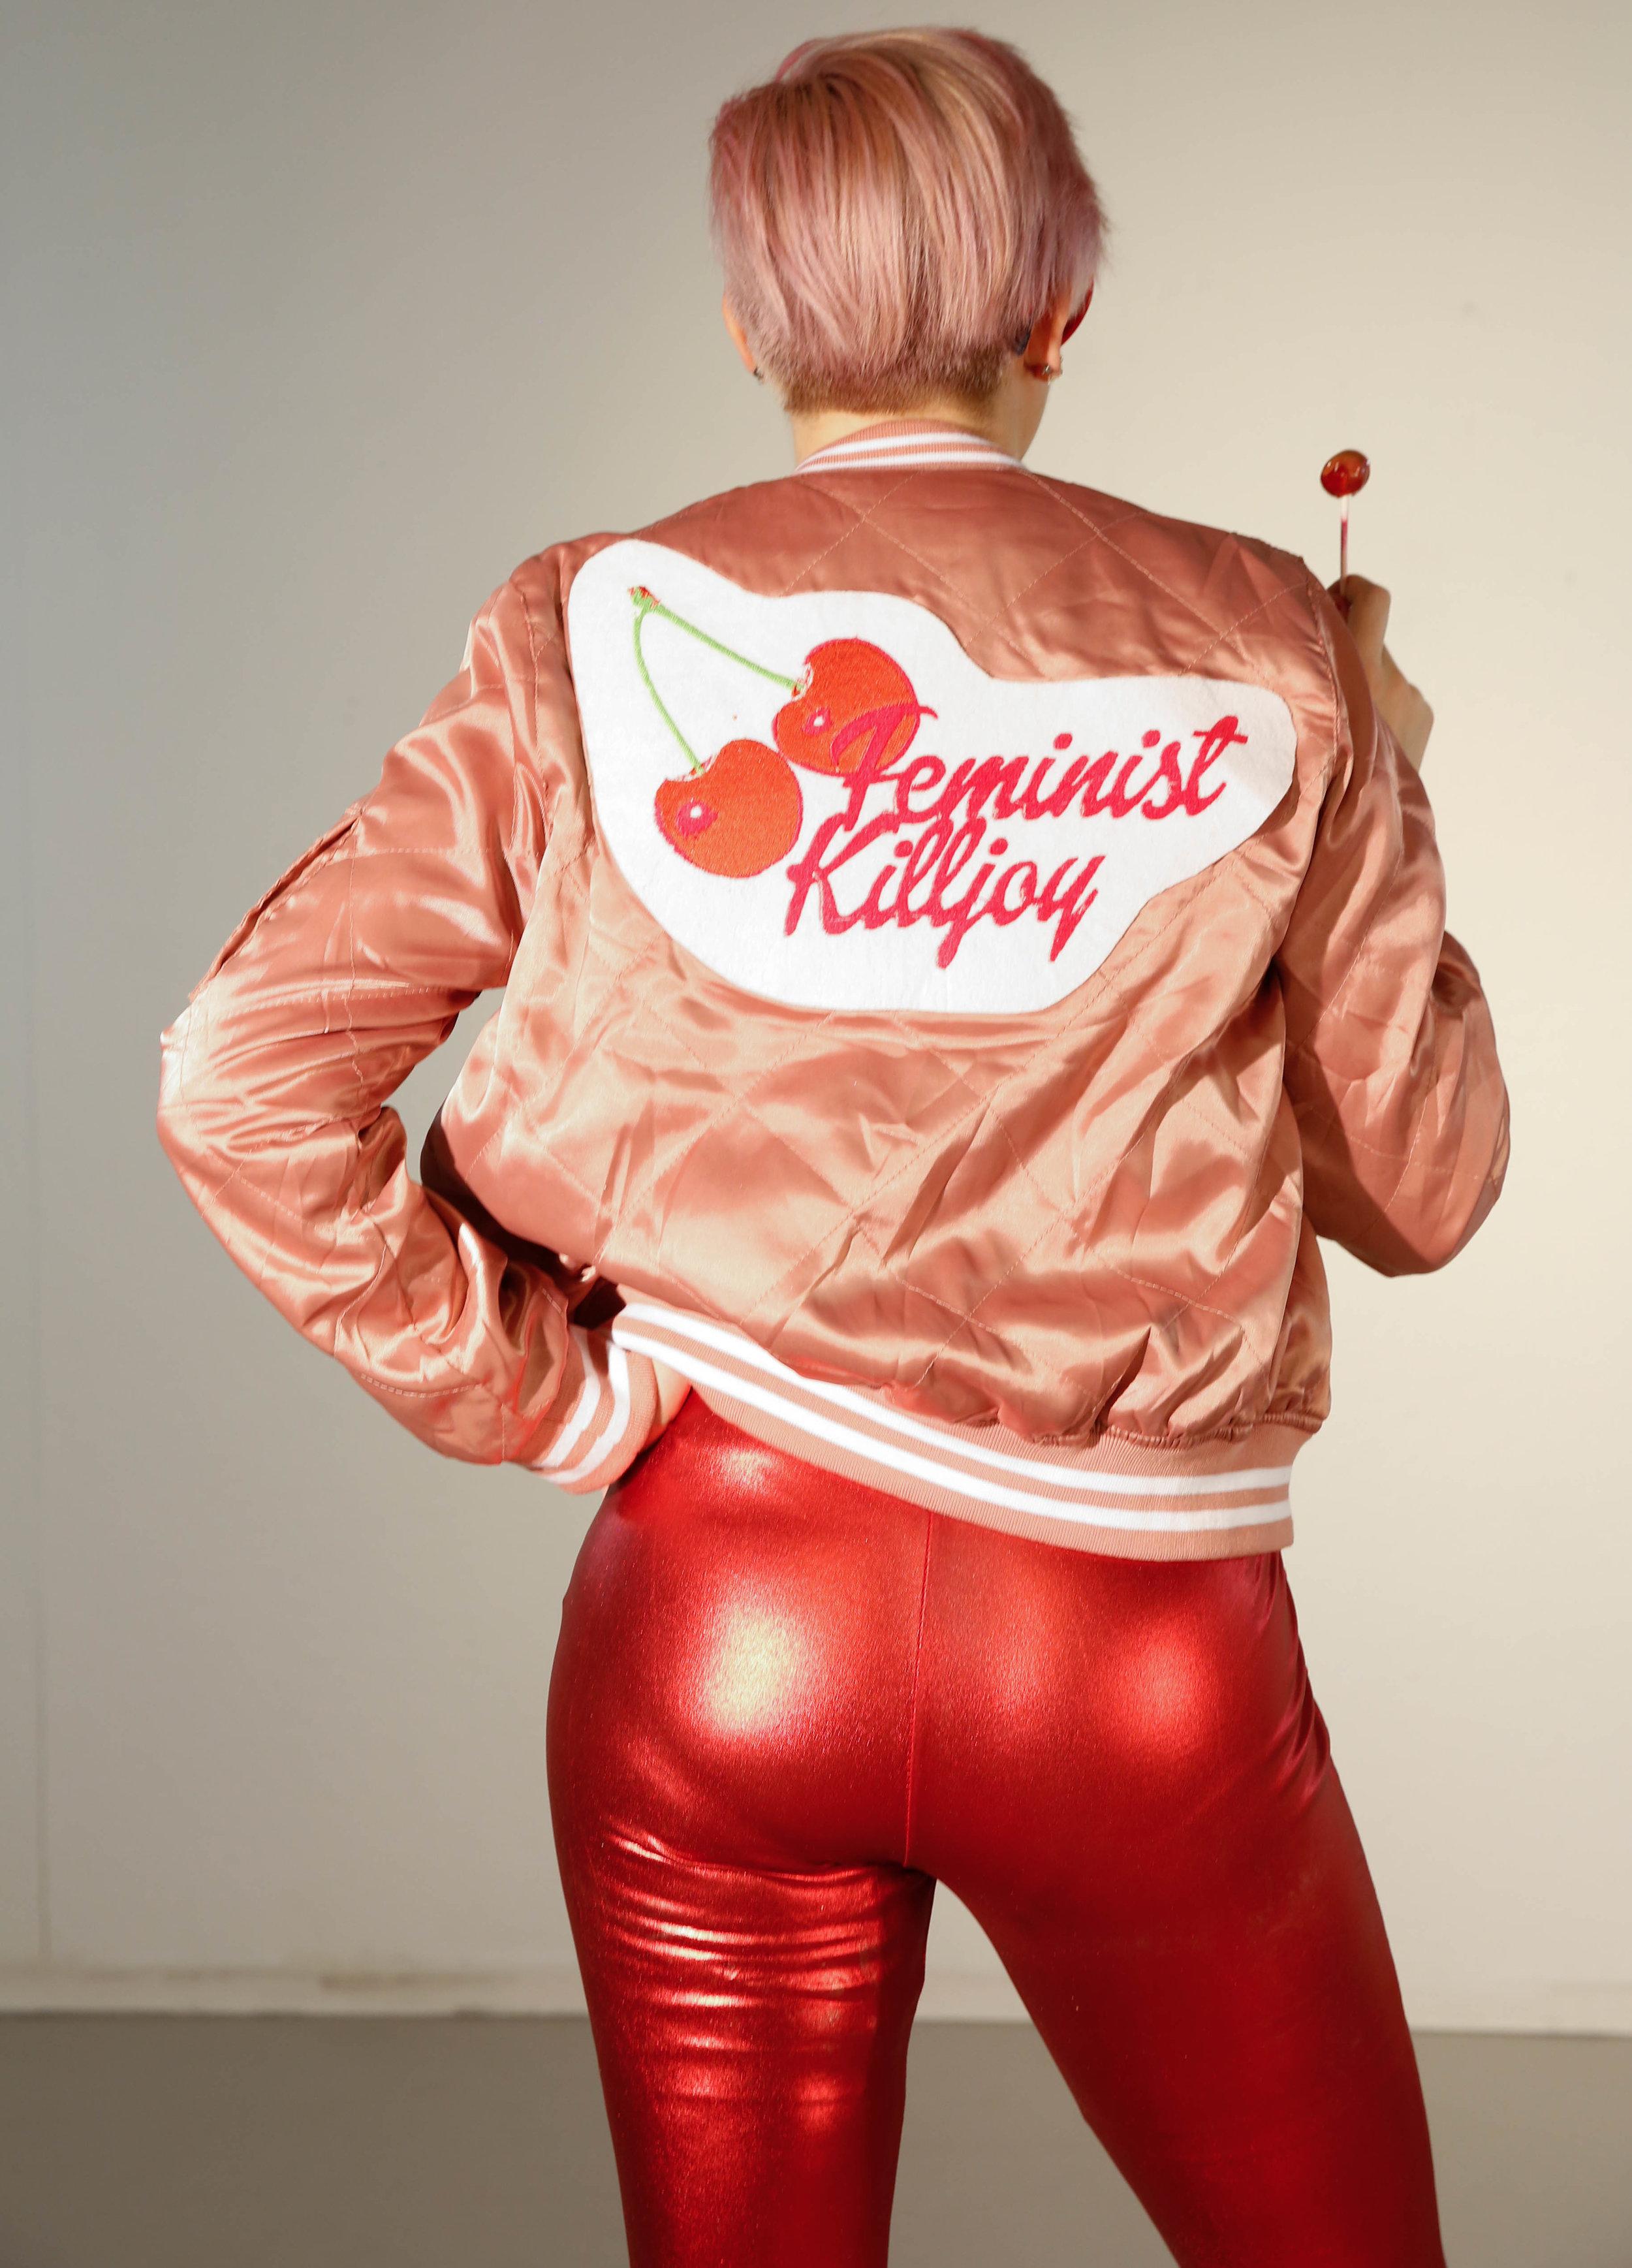 Feminist Killjoy (costume detail)